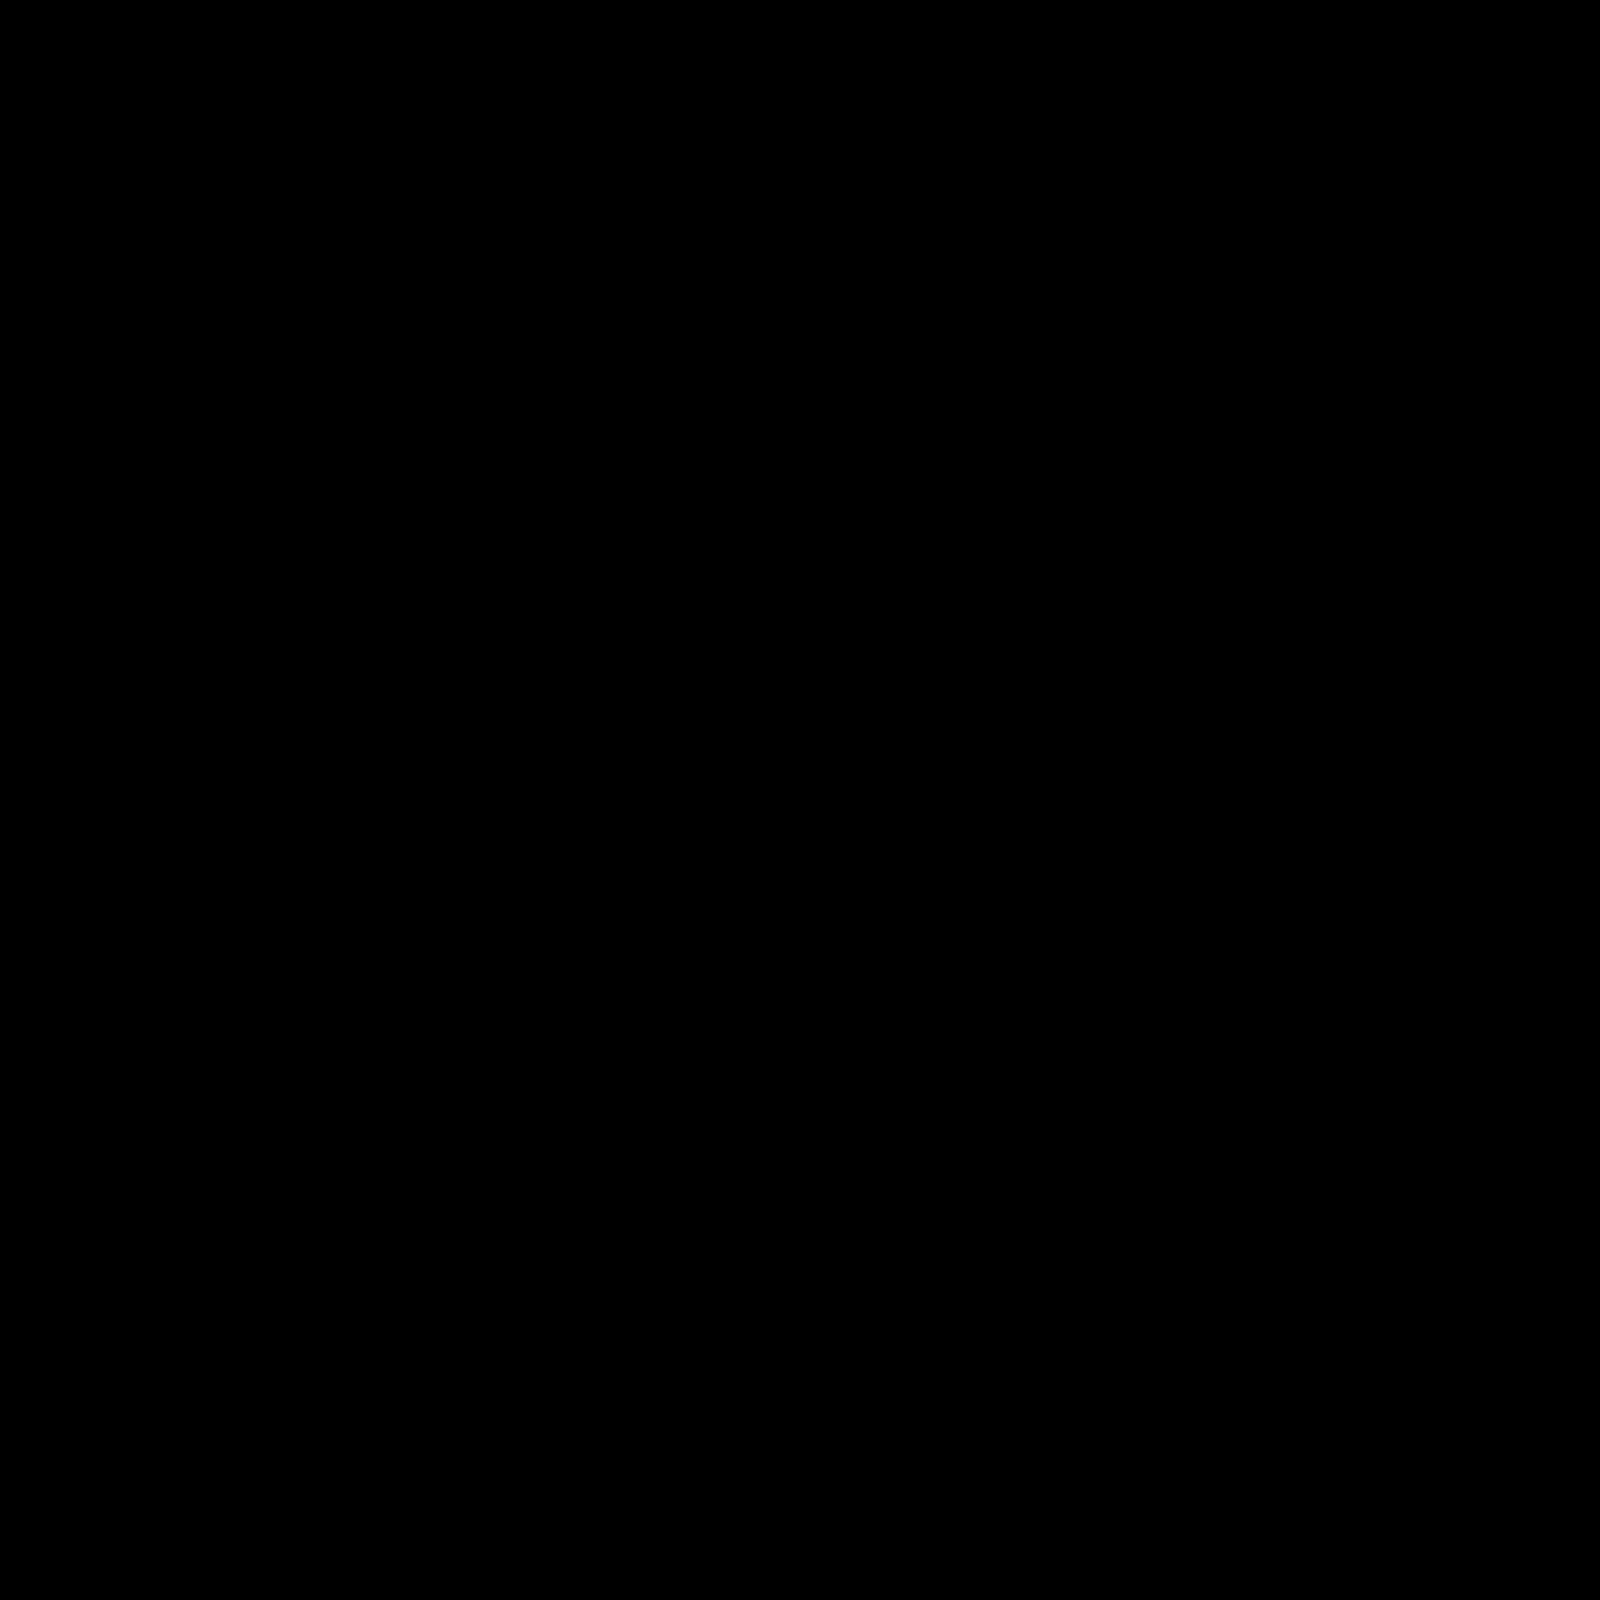 Exit Button PNG - 154138